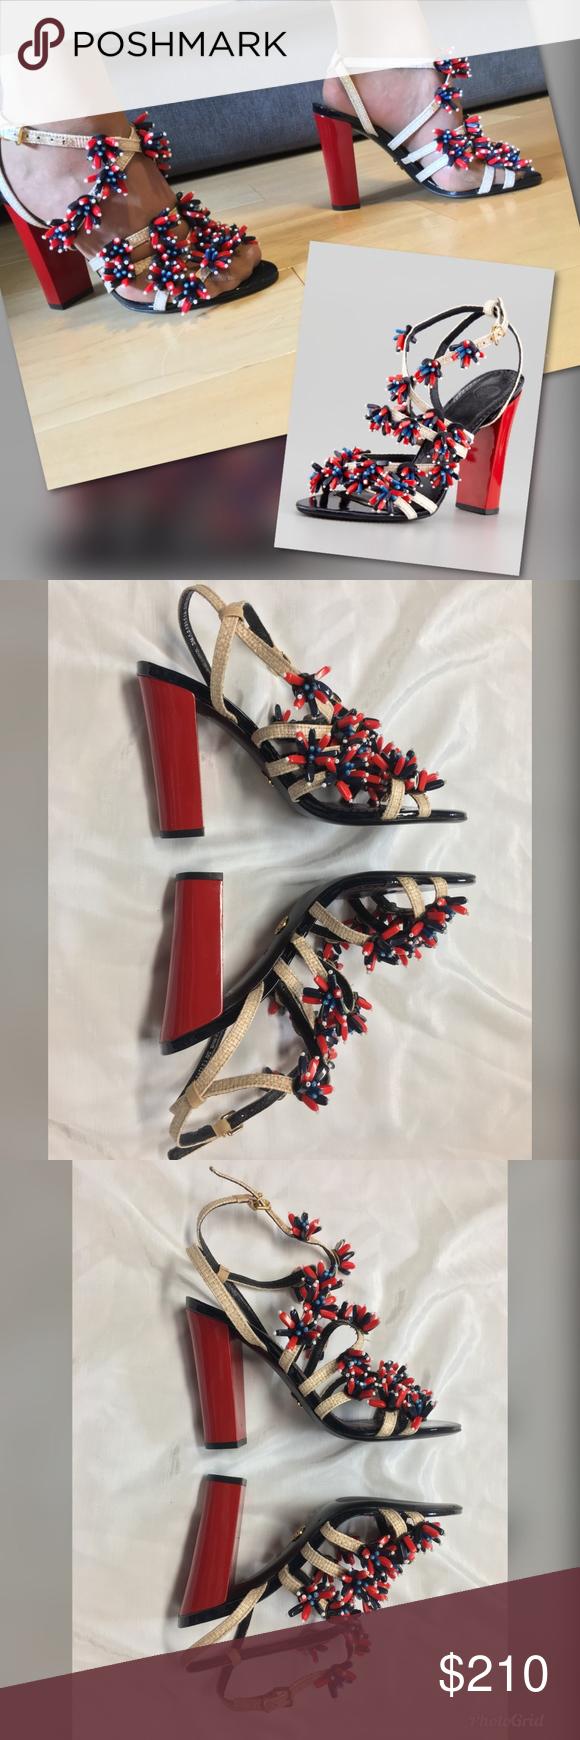 2c2fc18a6a8f TORY BURCH Ambrosia Beaded Raffia Runway Sandals